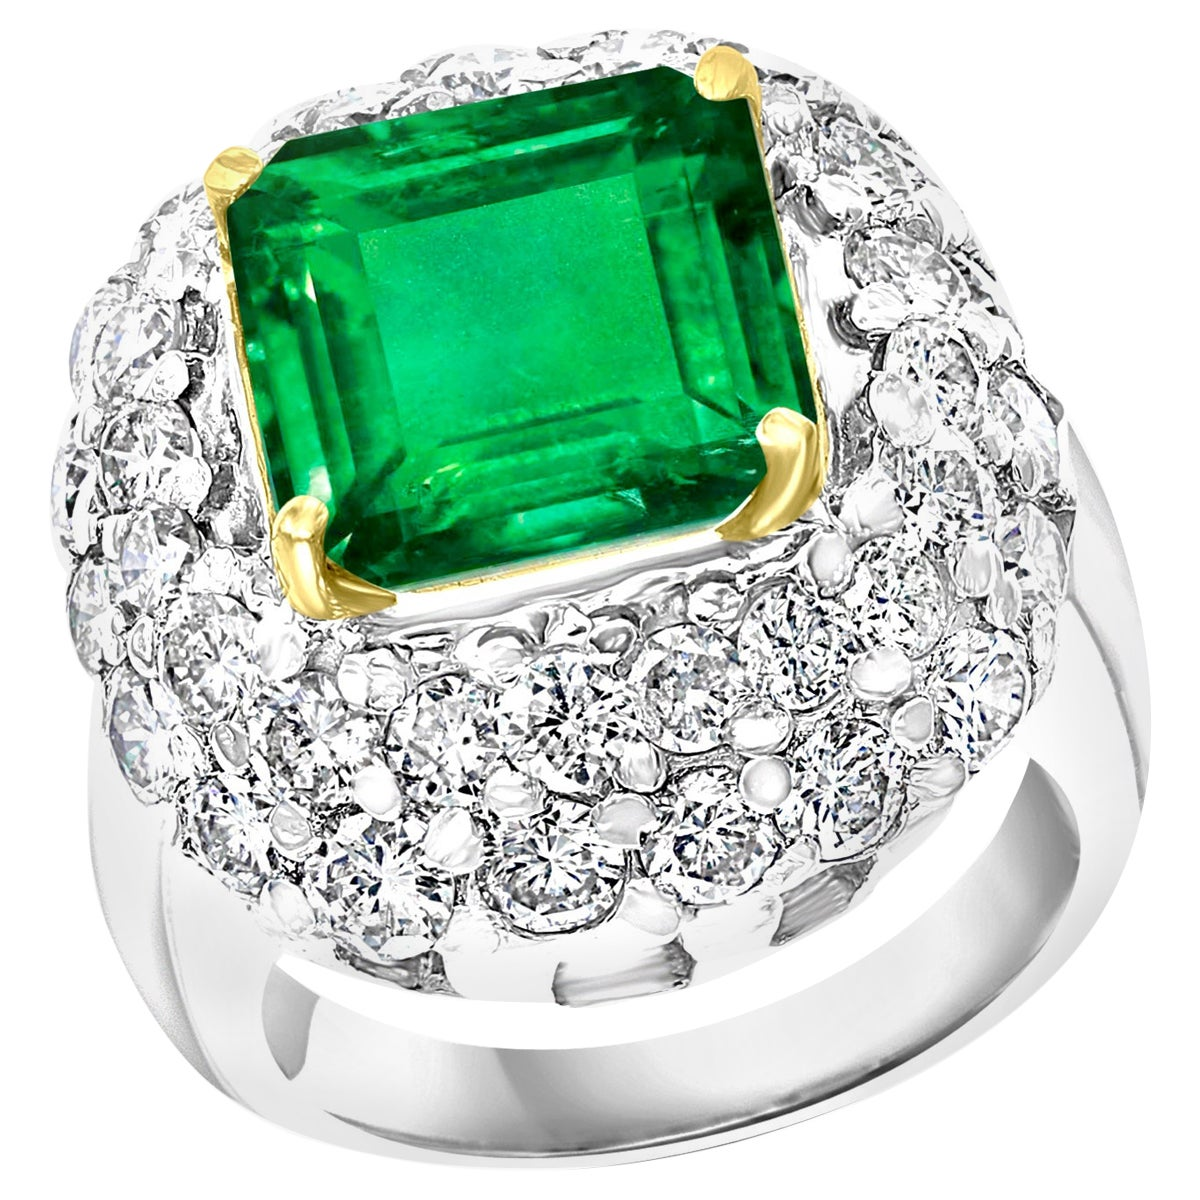 6 Carat Emerald Cut Colombian Emerald and 4 Carat Diamond Ring Platinum Two-Tone